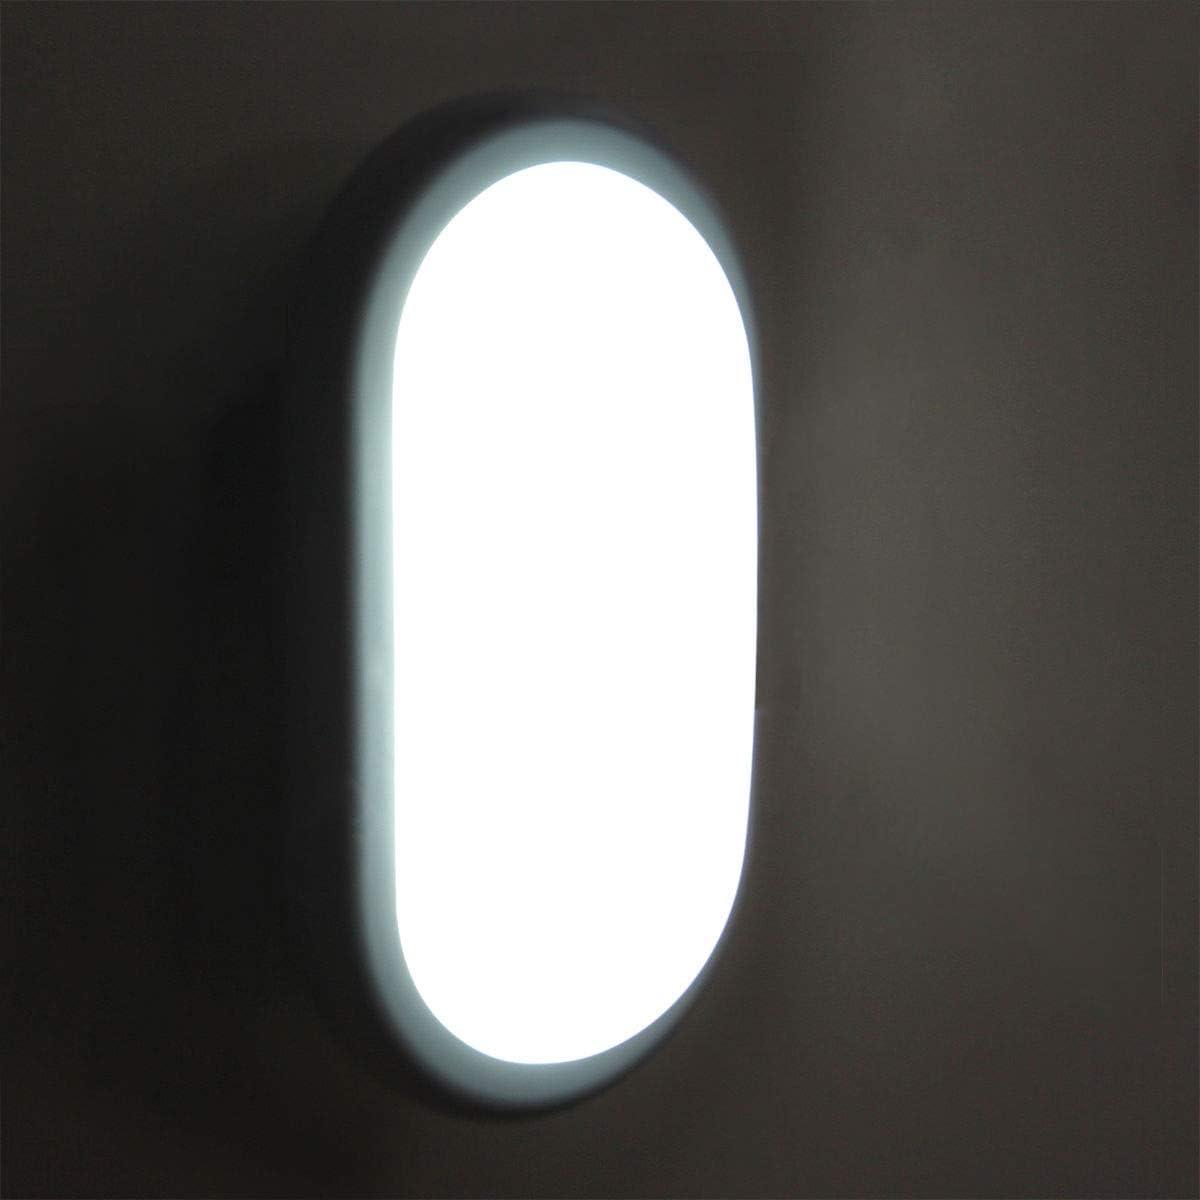 VARICART 18W LED Mampara Pared Montaje Enrasado Superficie L/ámpara Redonda Seguridad IP65 Hidr/ófuga Interior Exterior Ba/ño Techo Hall Escalera Garaje Porche 3000K Blanco C/álido 1800lm 150W Equiv